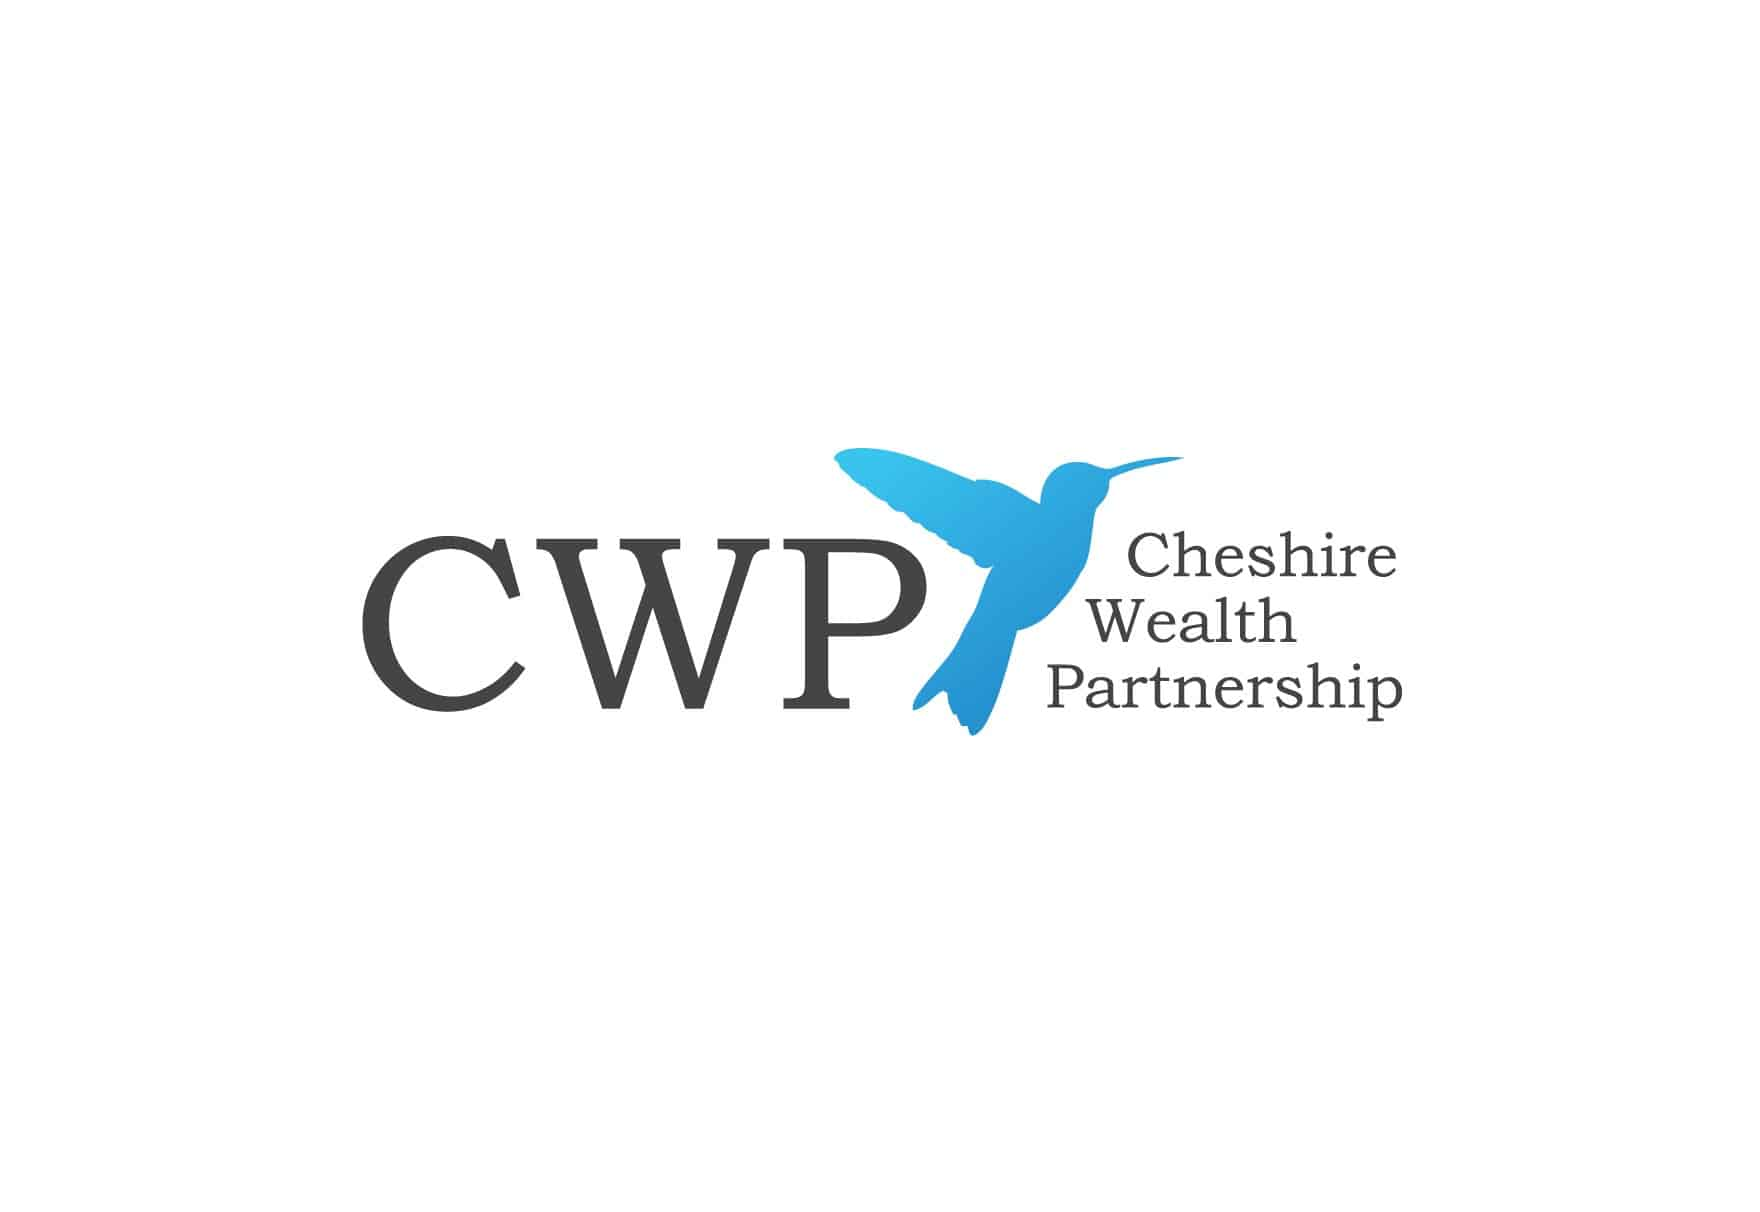 cwp-logo-design